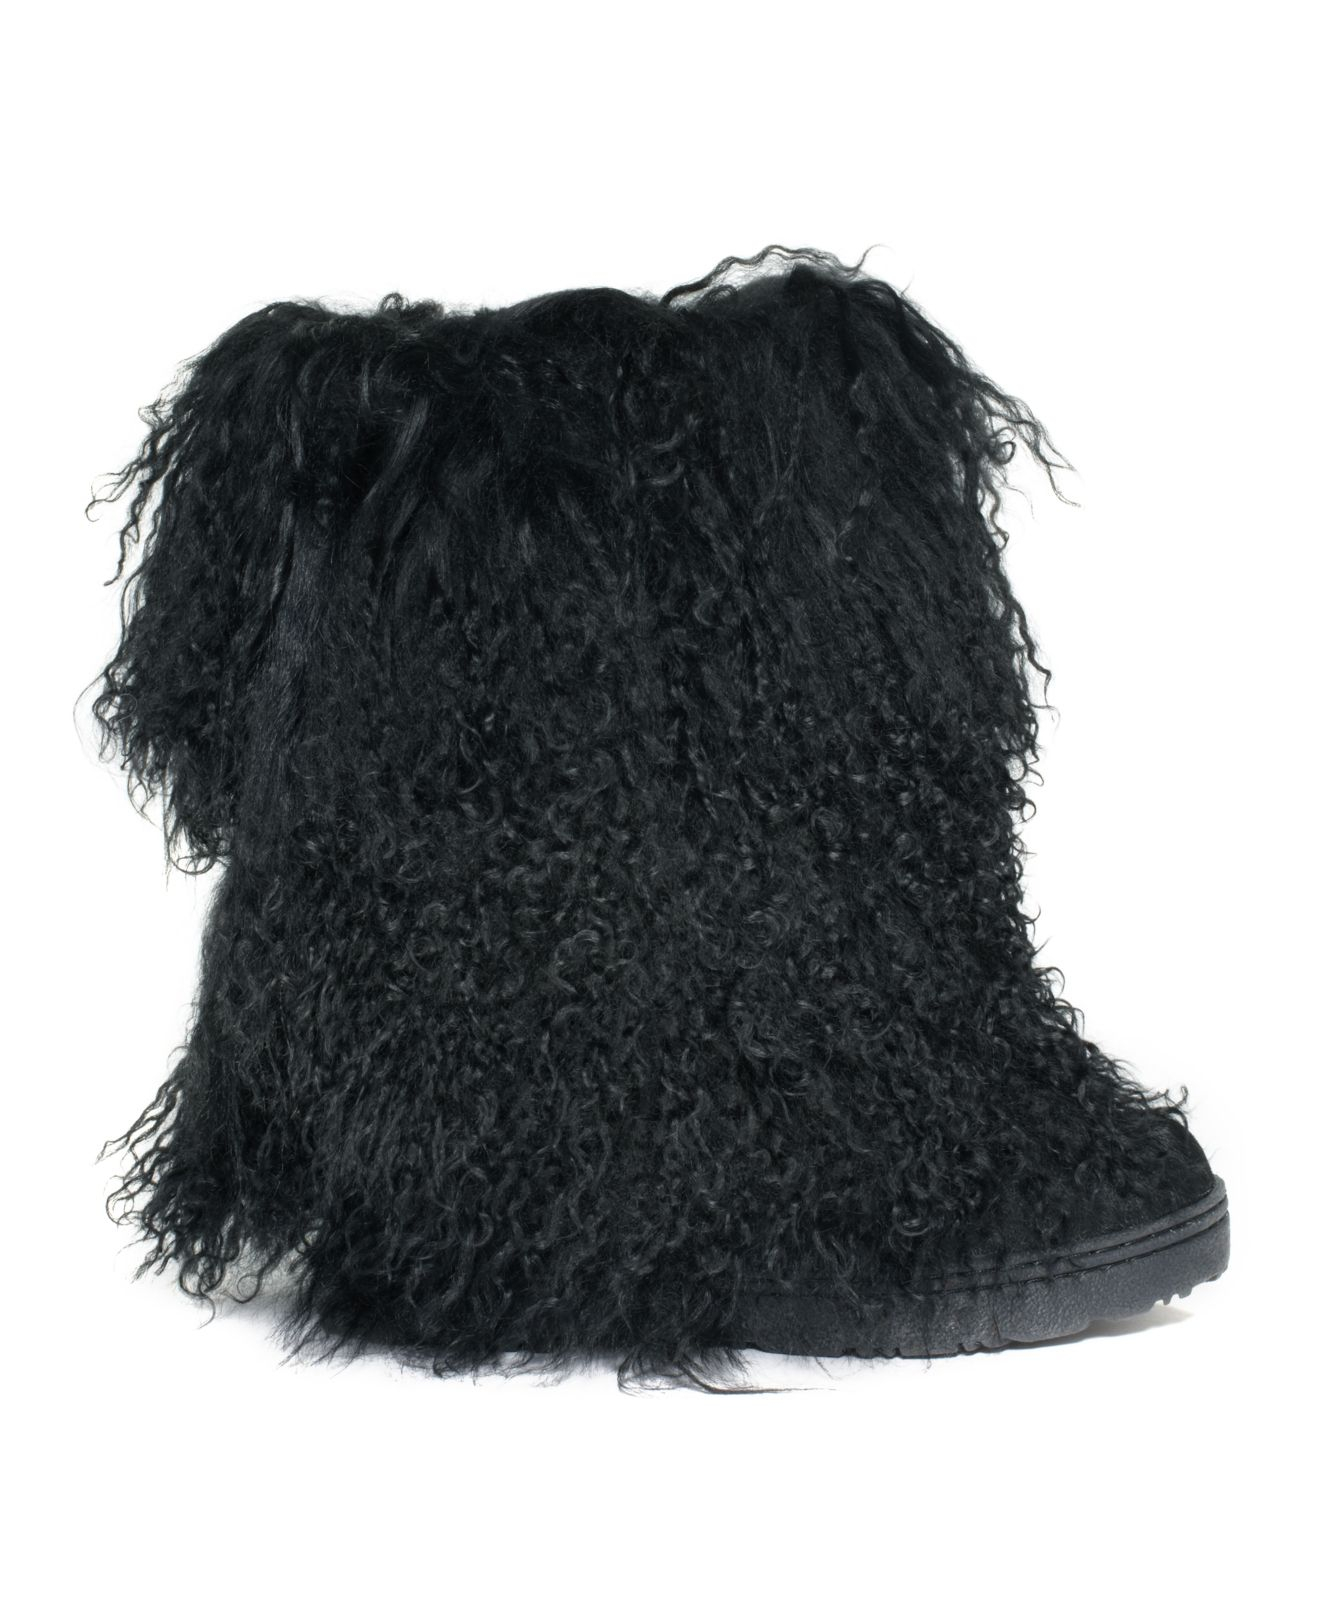 bearpaw boetis ii cold weather boots in black black